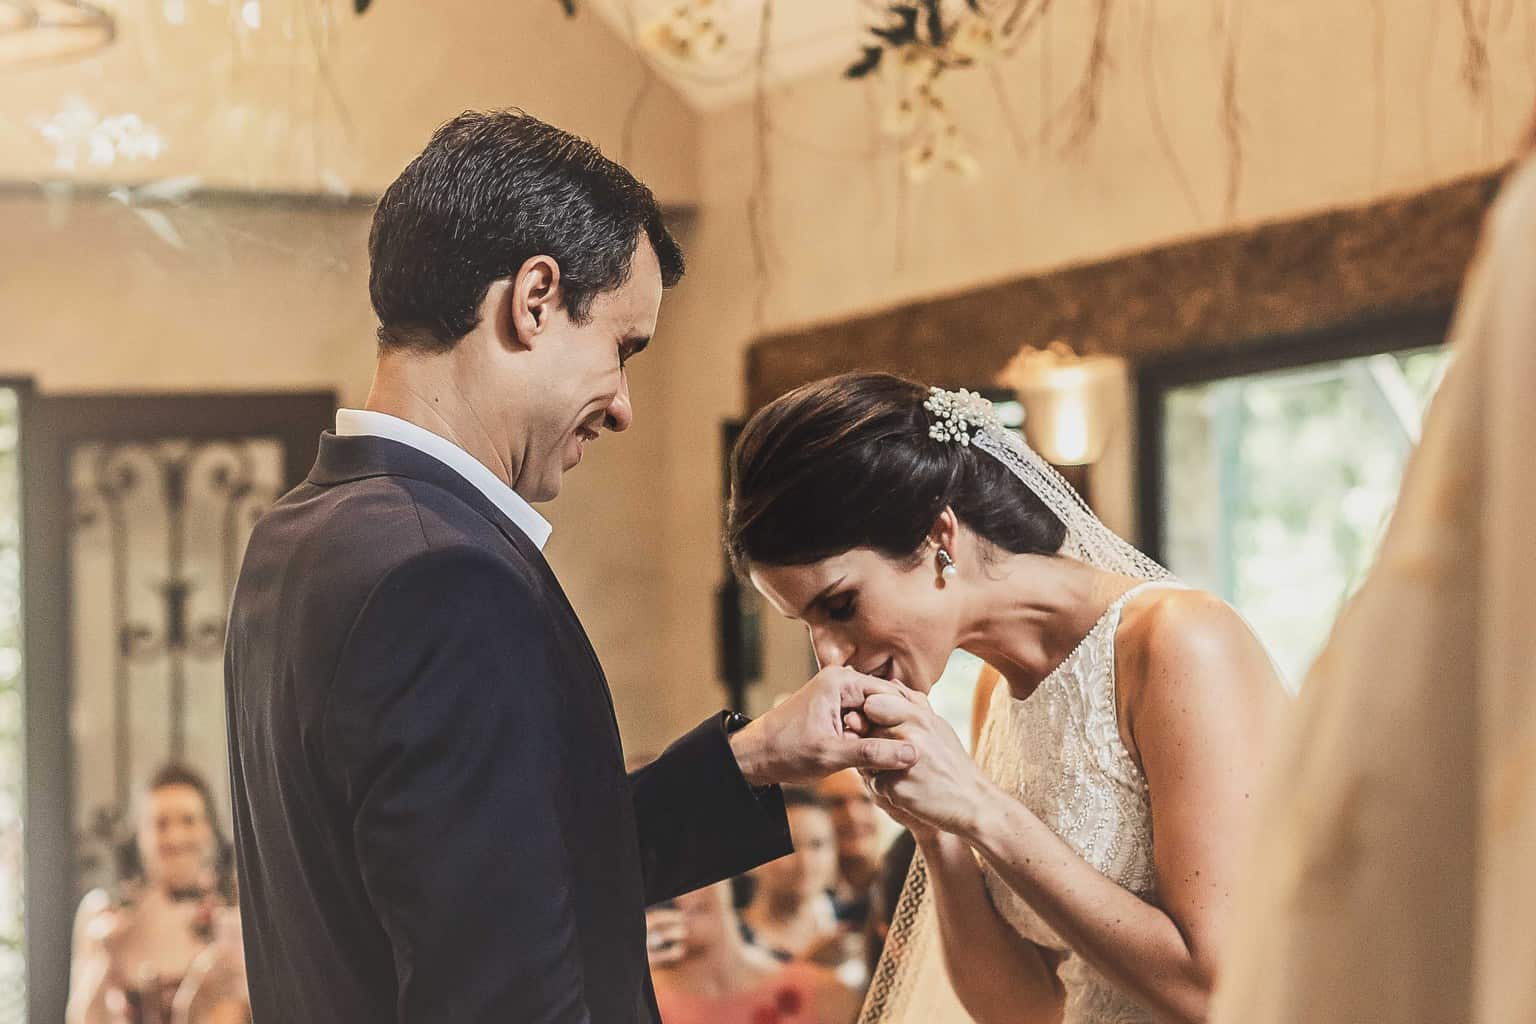 casamento-Ana-Cecilia-e-Leonardo-casamento-na-serra-cerimonia-graviola-filmes-graviolafilmes-laura-camapnella-de-siervi-lauracampanella-studio-laura-camapnella24